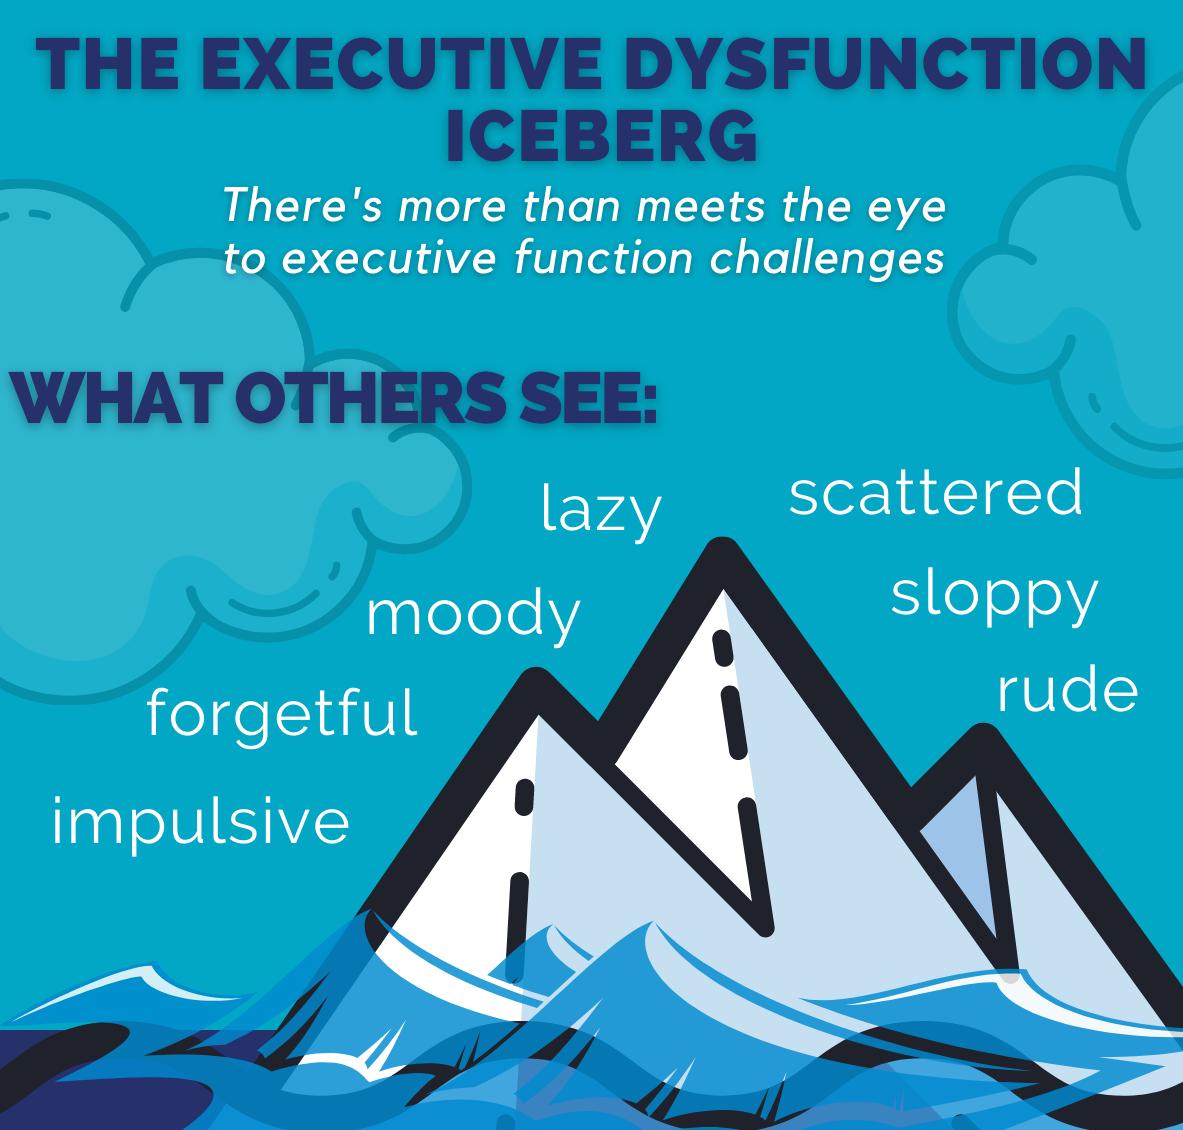 the Executive Dysfunction iceberg